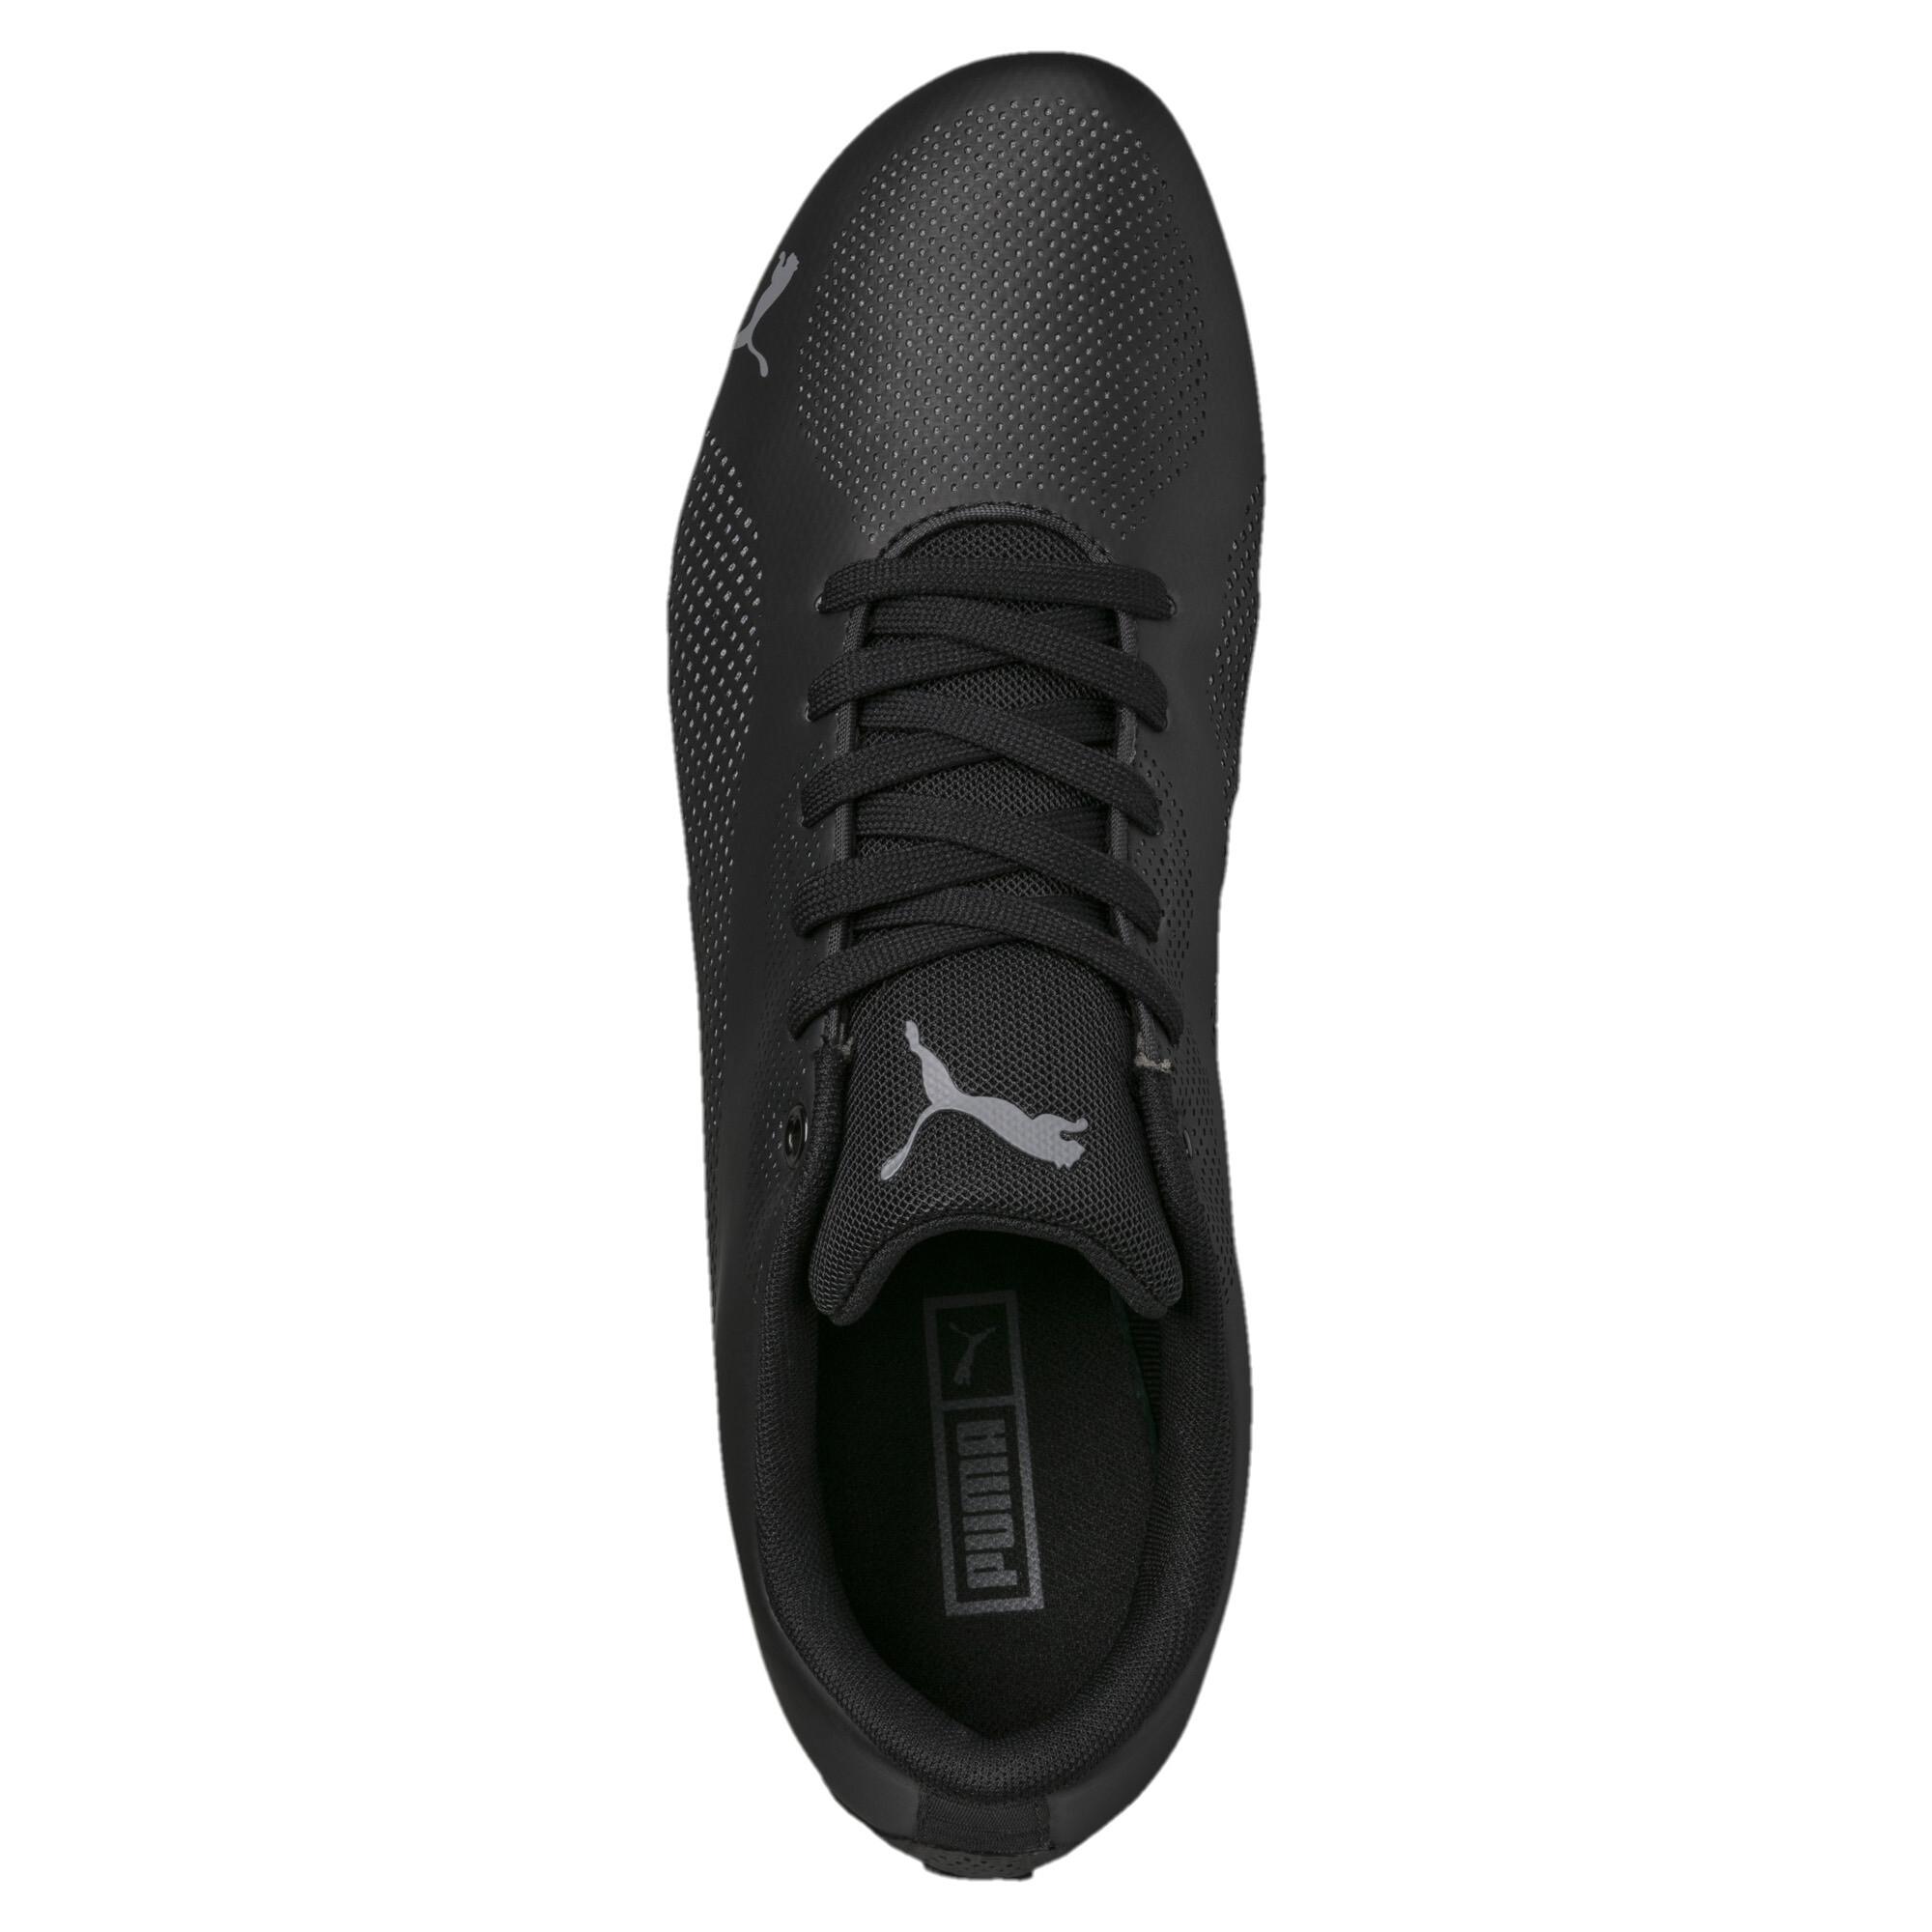 PUMA-Drift-Cat-5-Ultra-Men-s-Shoes-Men-Shoe-Sport-Classics thumbnail 6